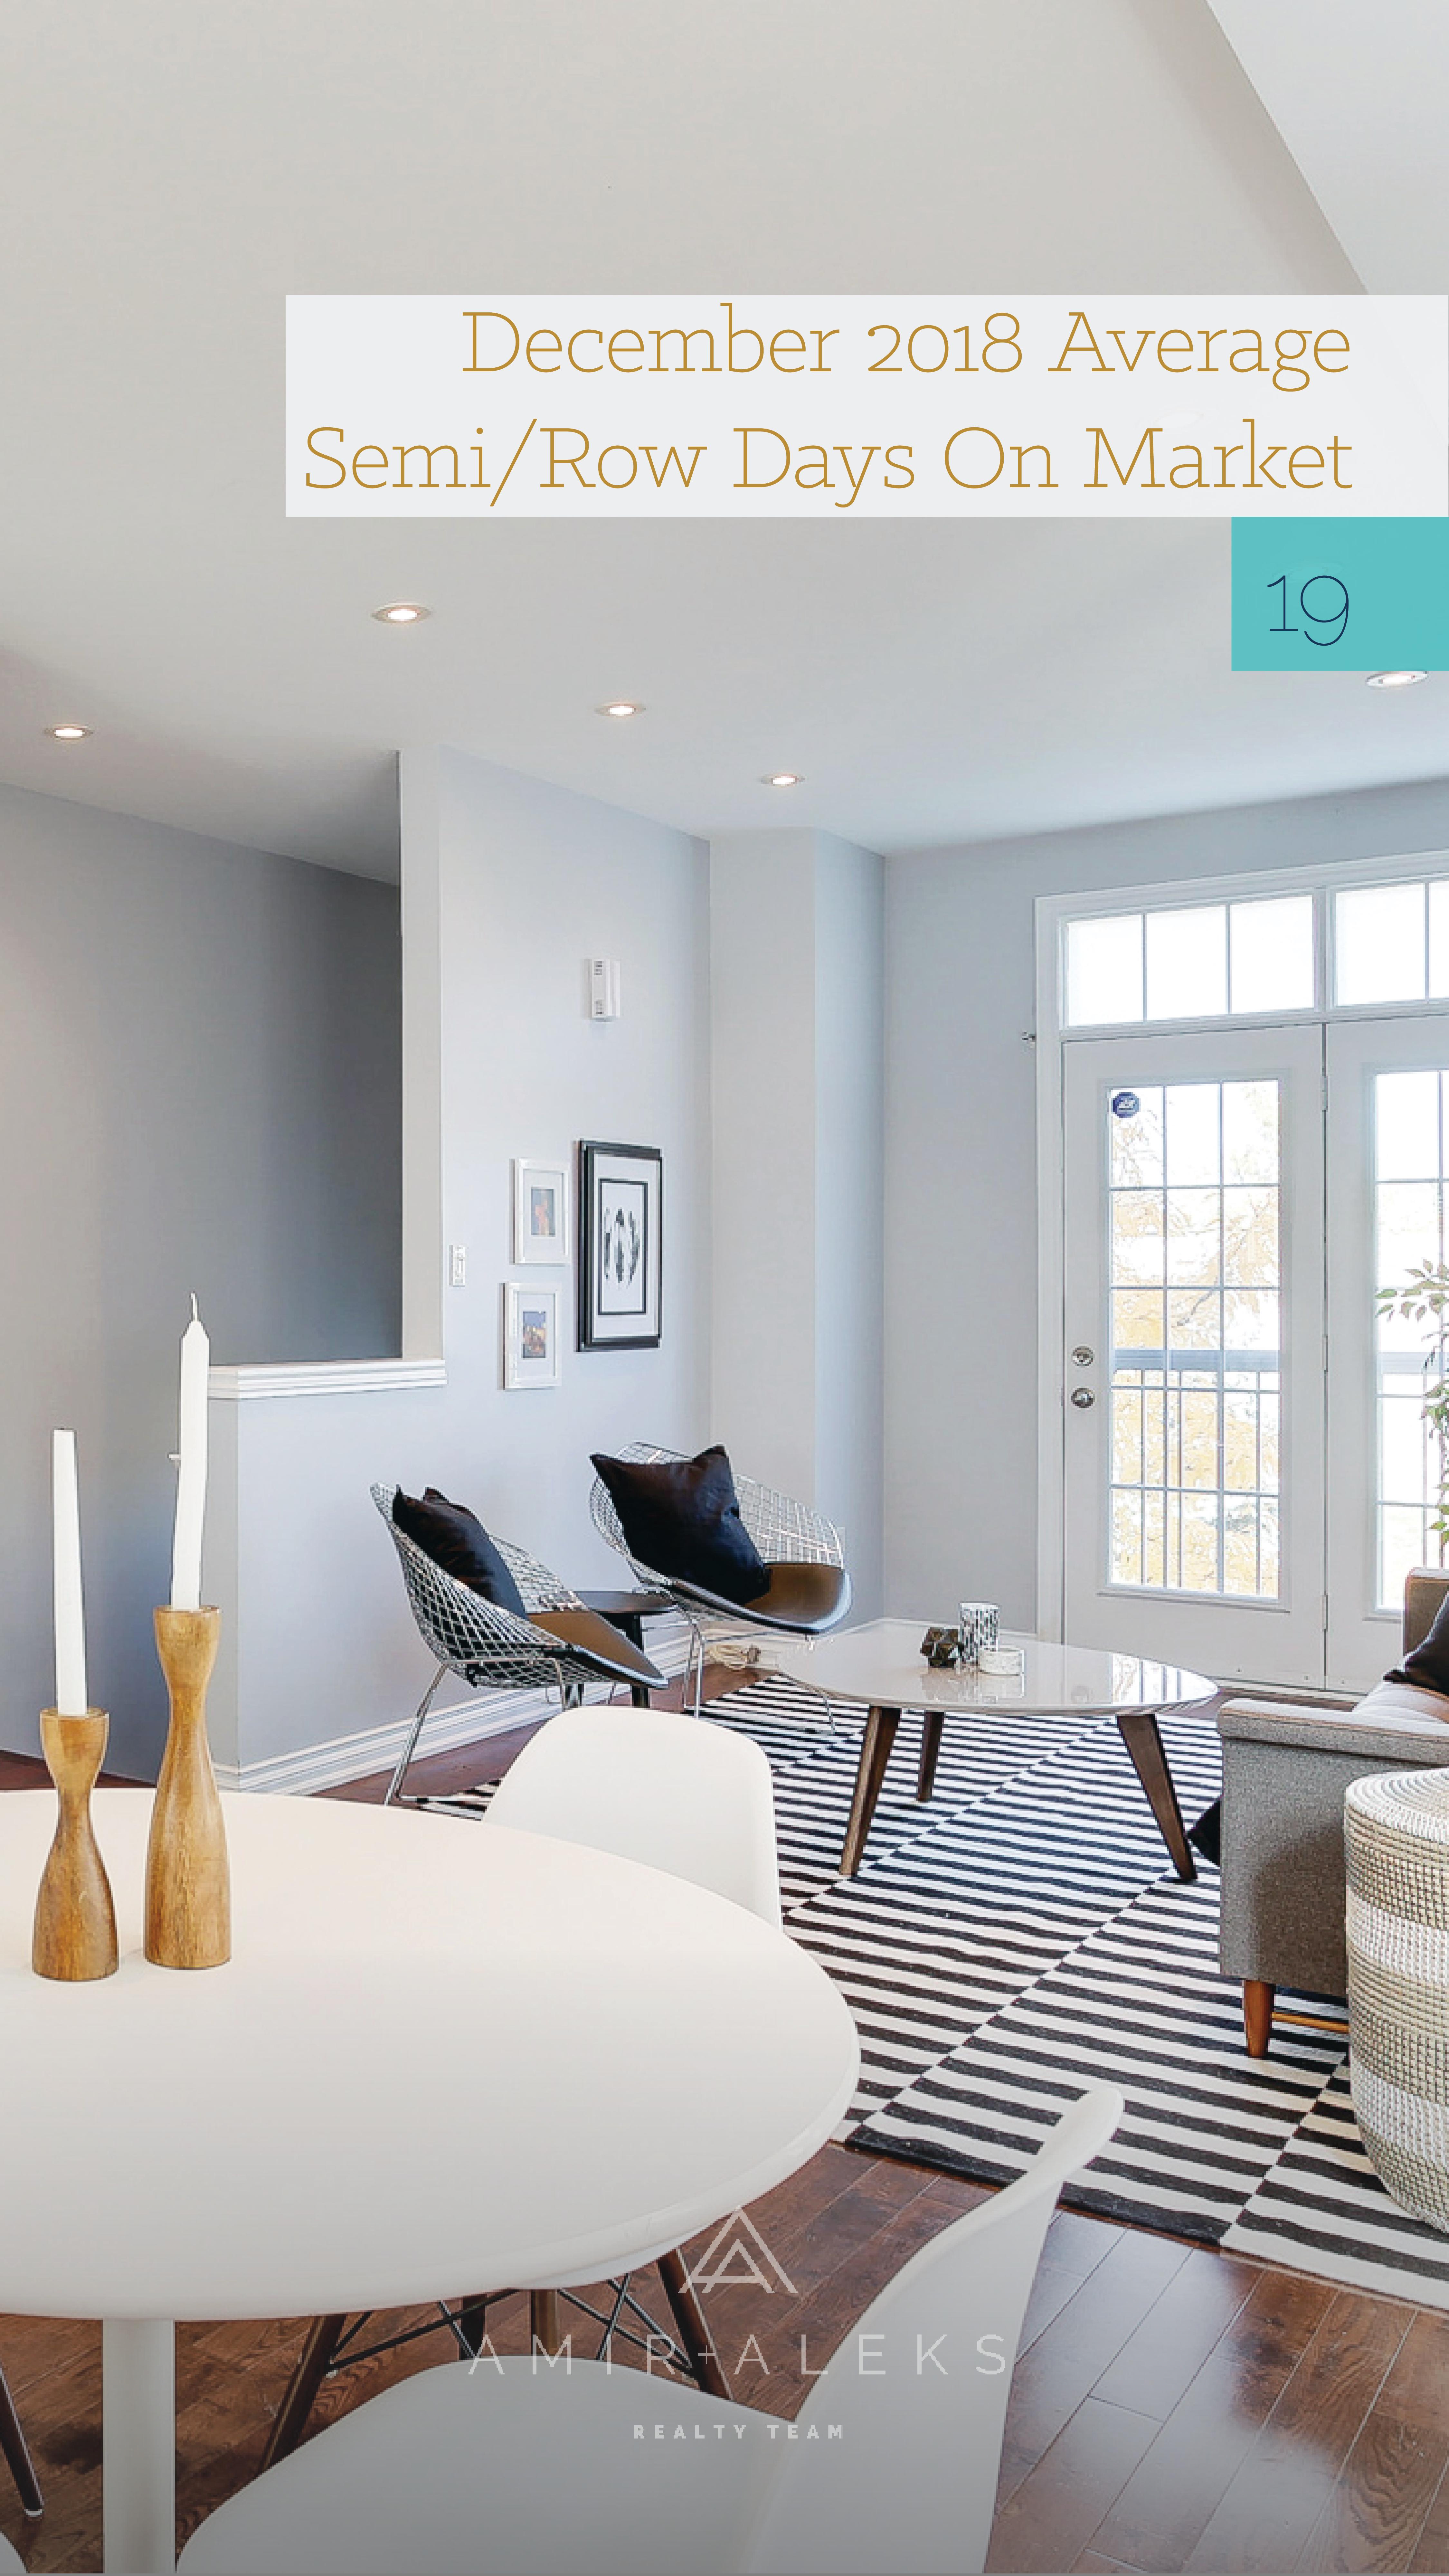 Market Snapshots December 2018 Home decor, Real estate